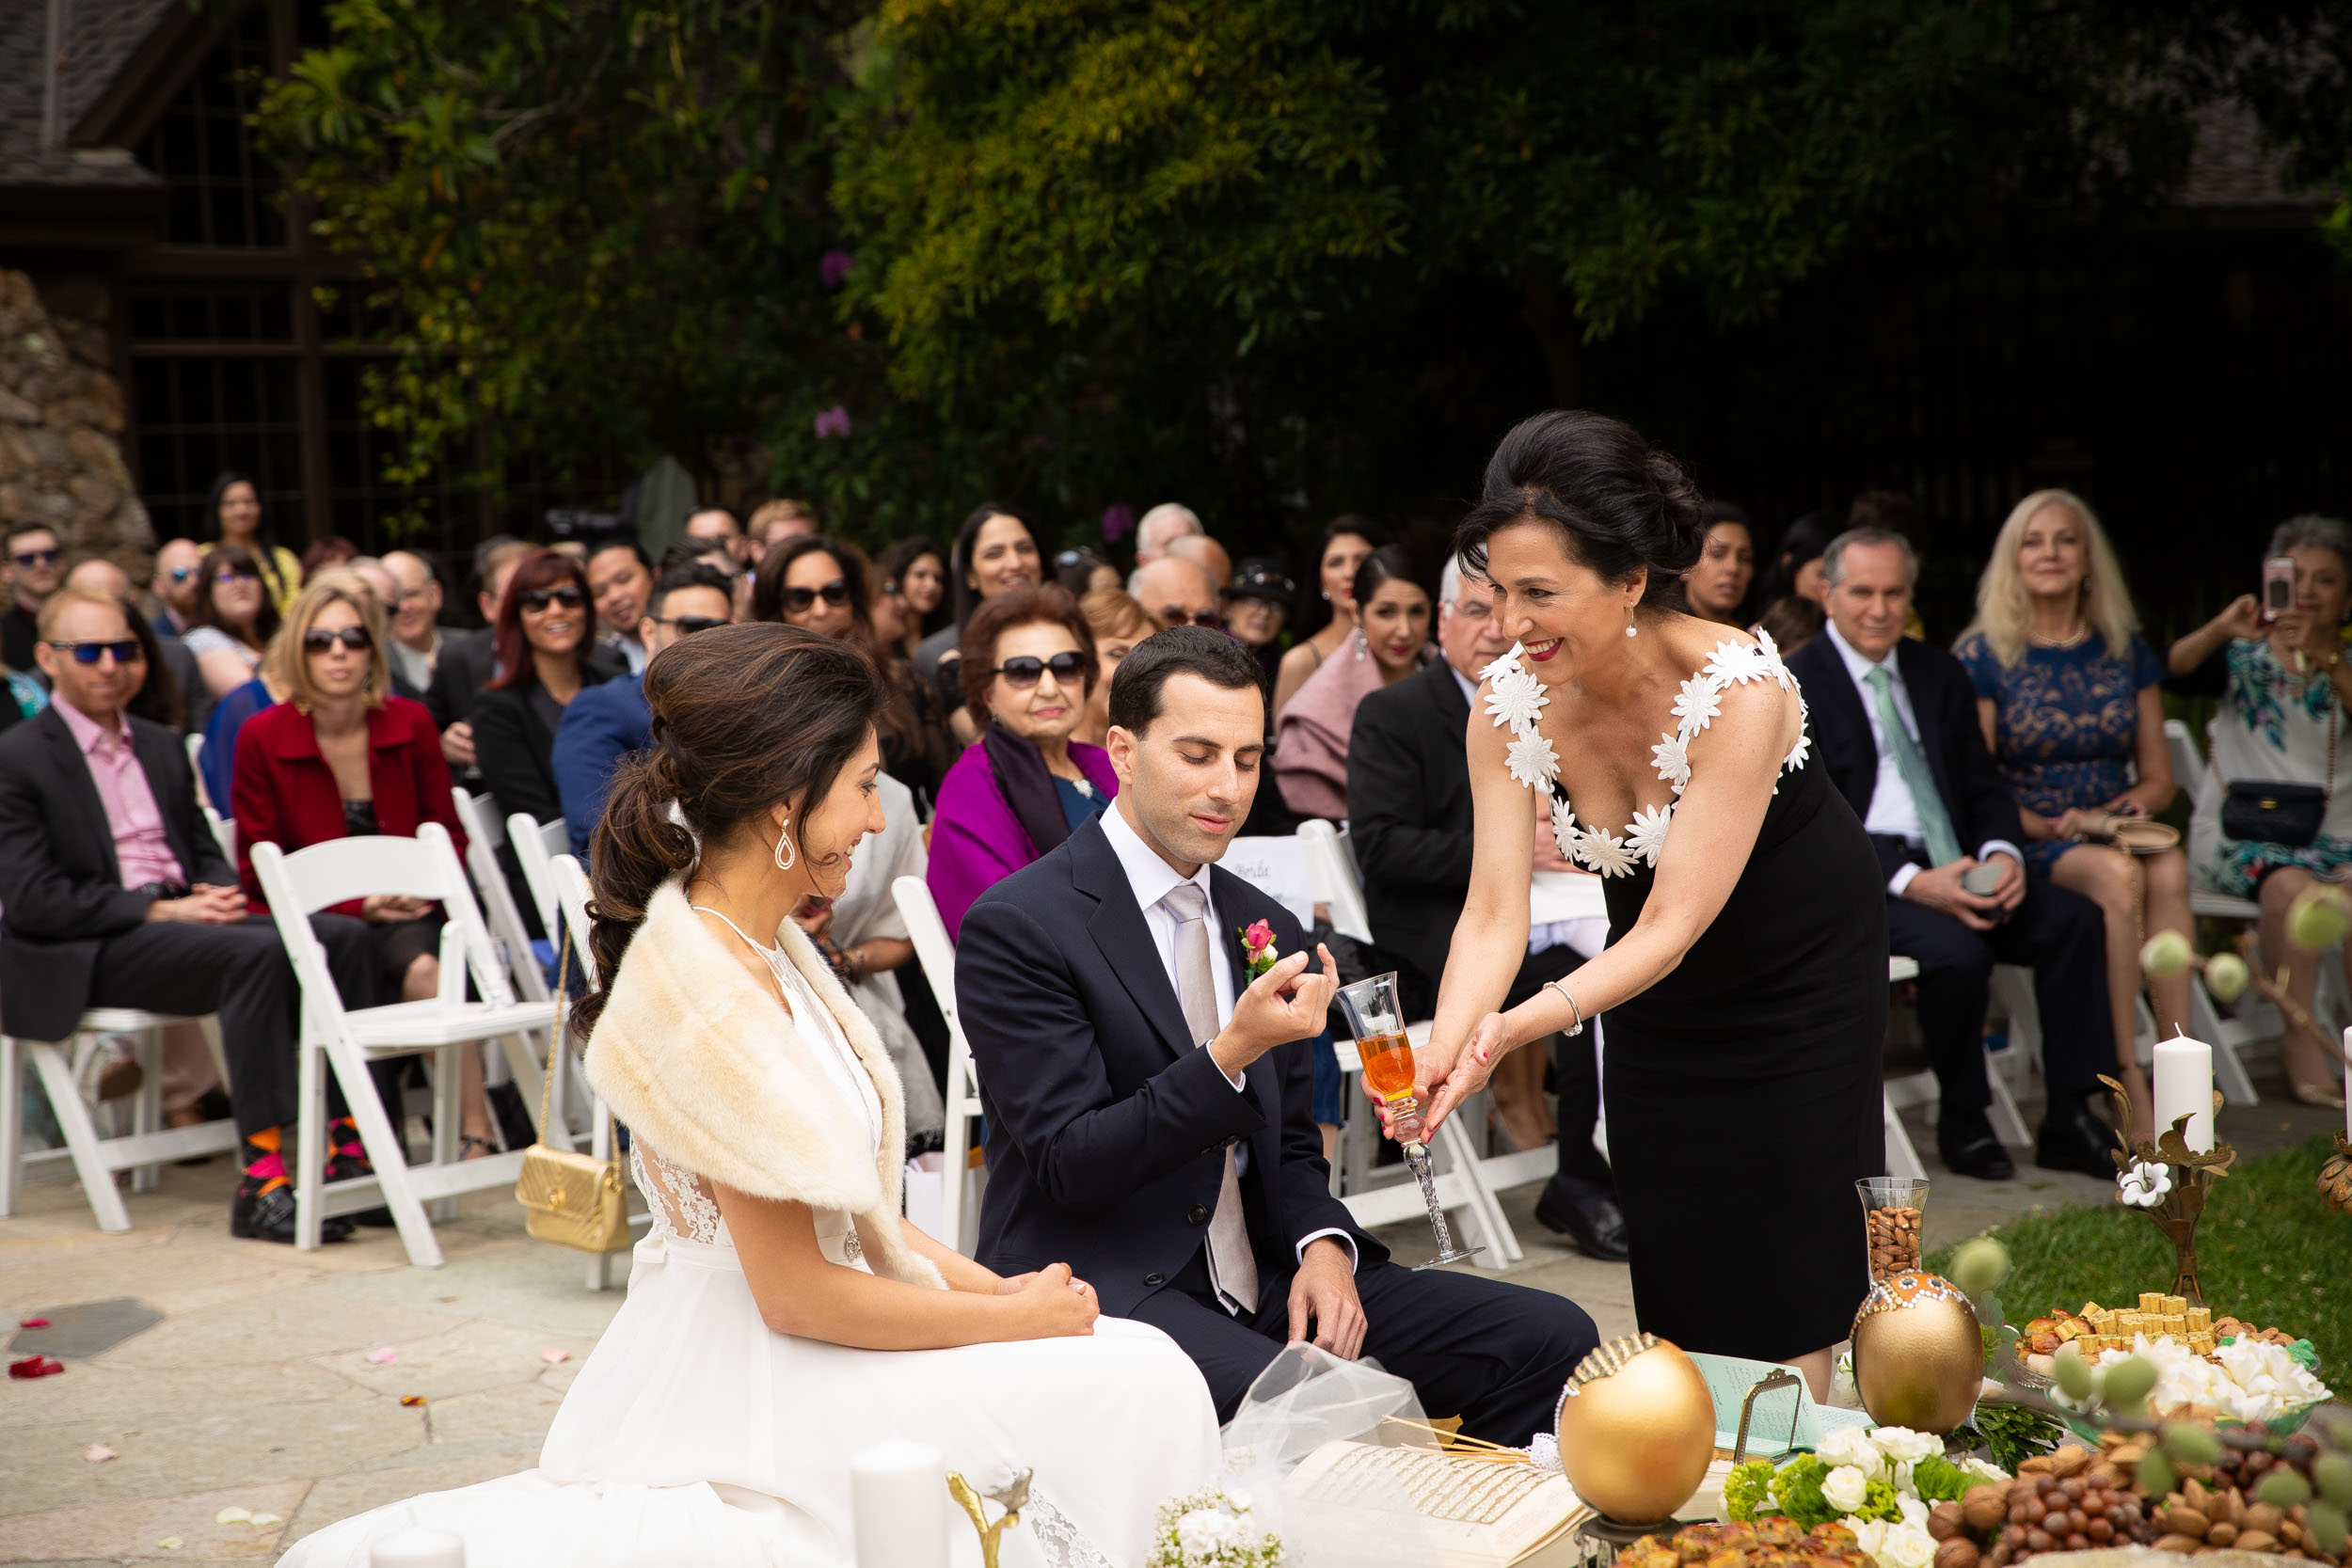 Brazilian-Room-wedding-Persian-ceremony-61.jpg